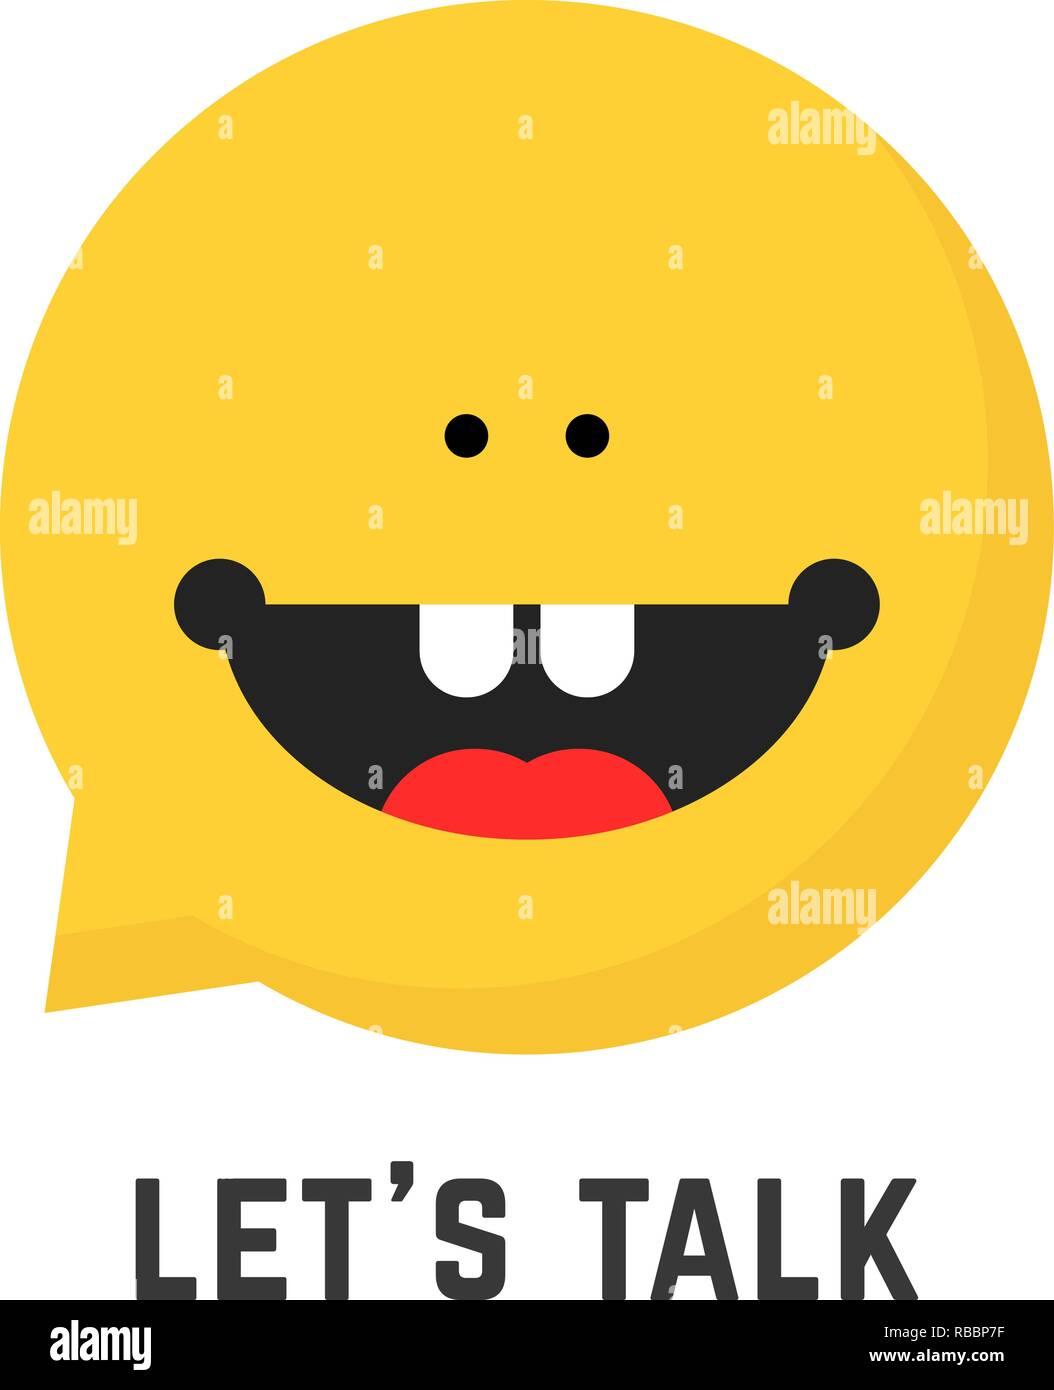 childish speech therapist logo - Stock Image